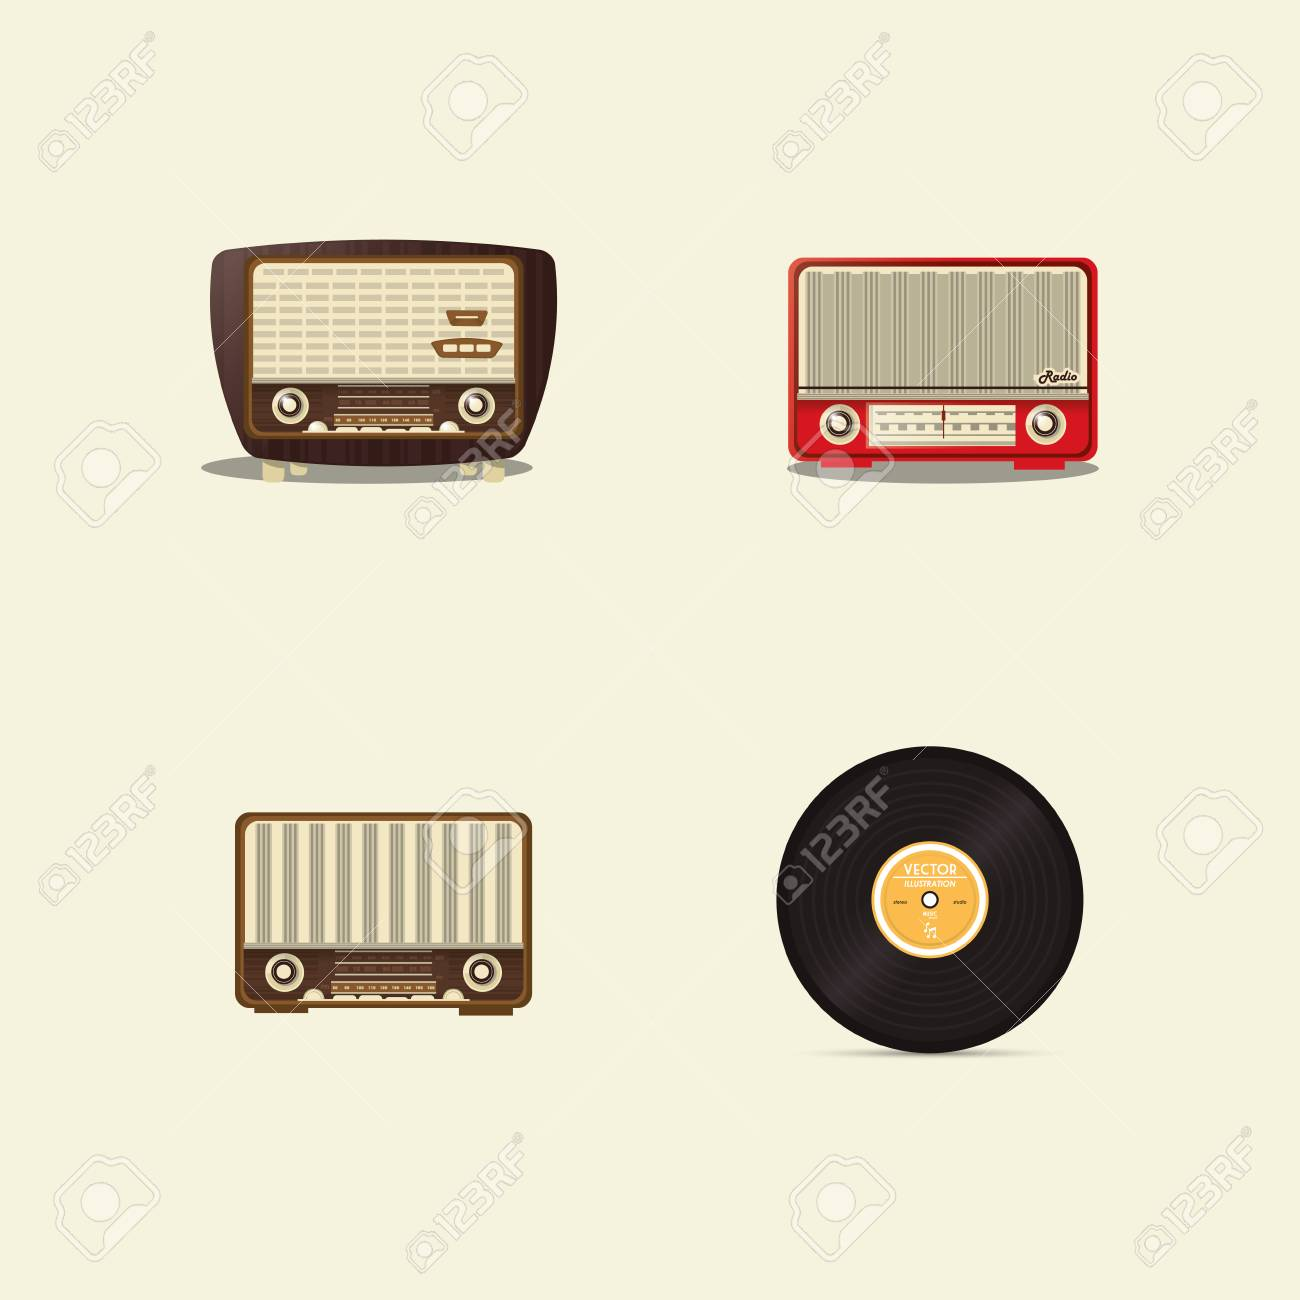 Flat Design Retro Radio With Vinyl Record Image Vector Illustration ...